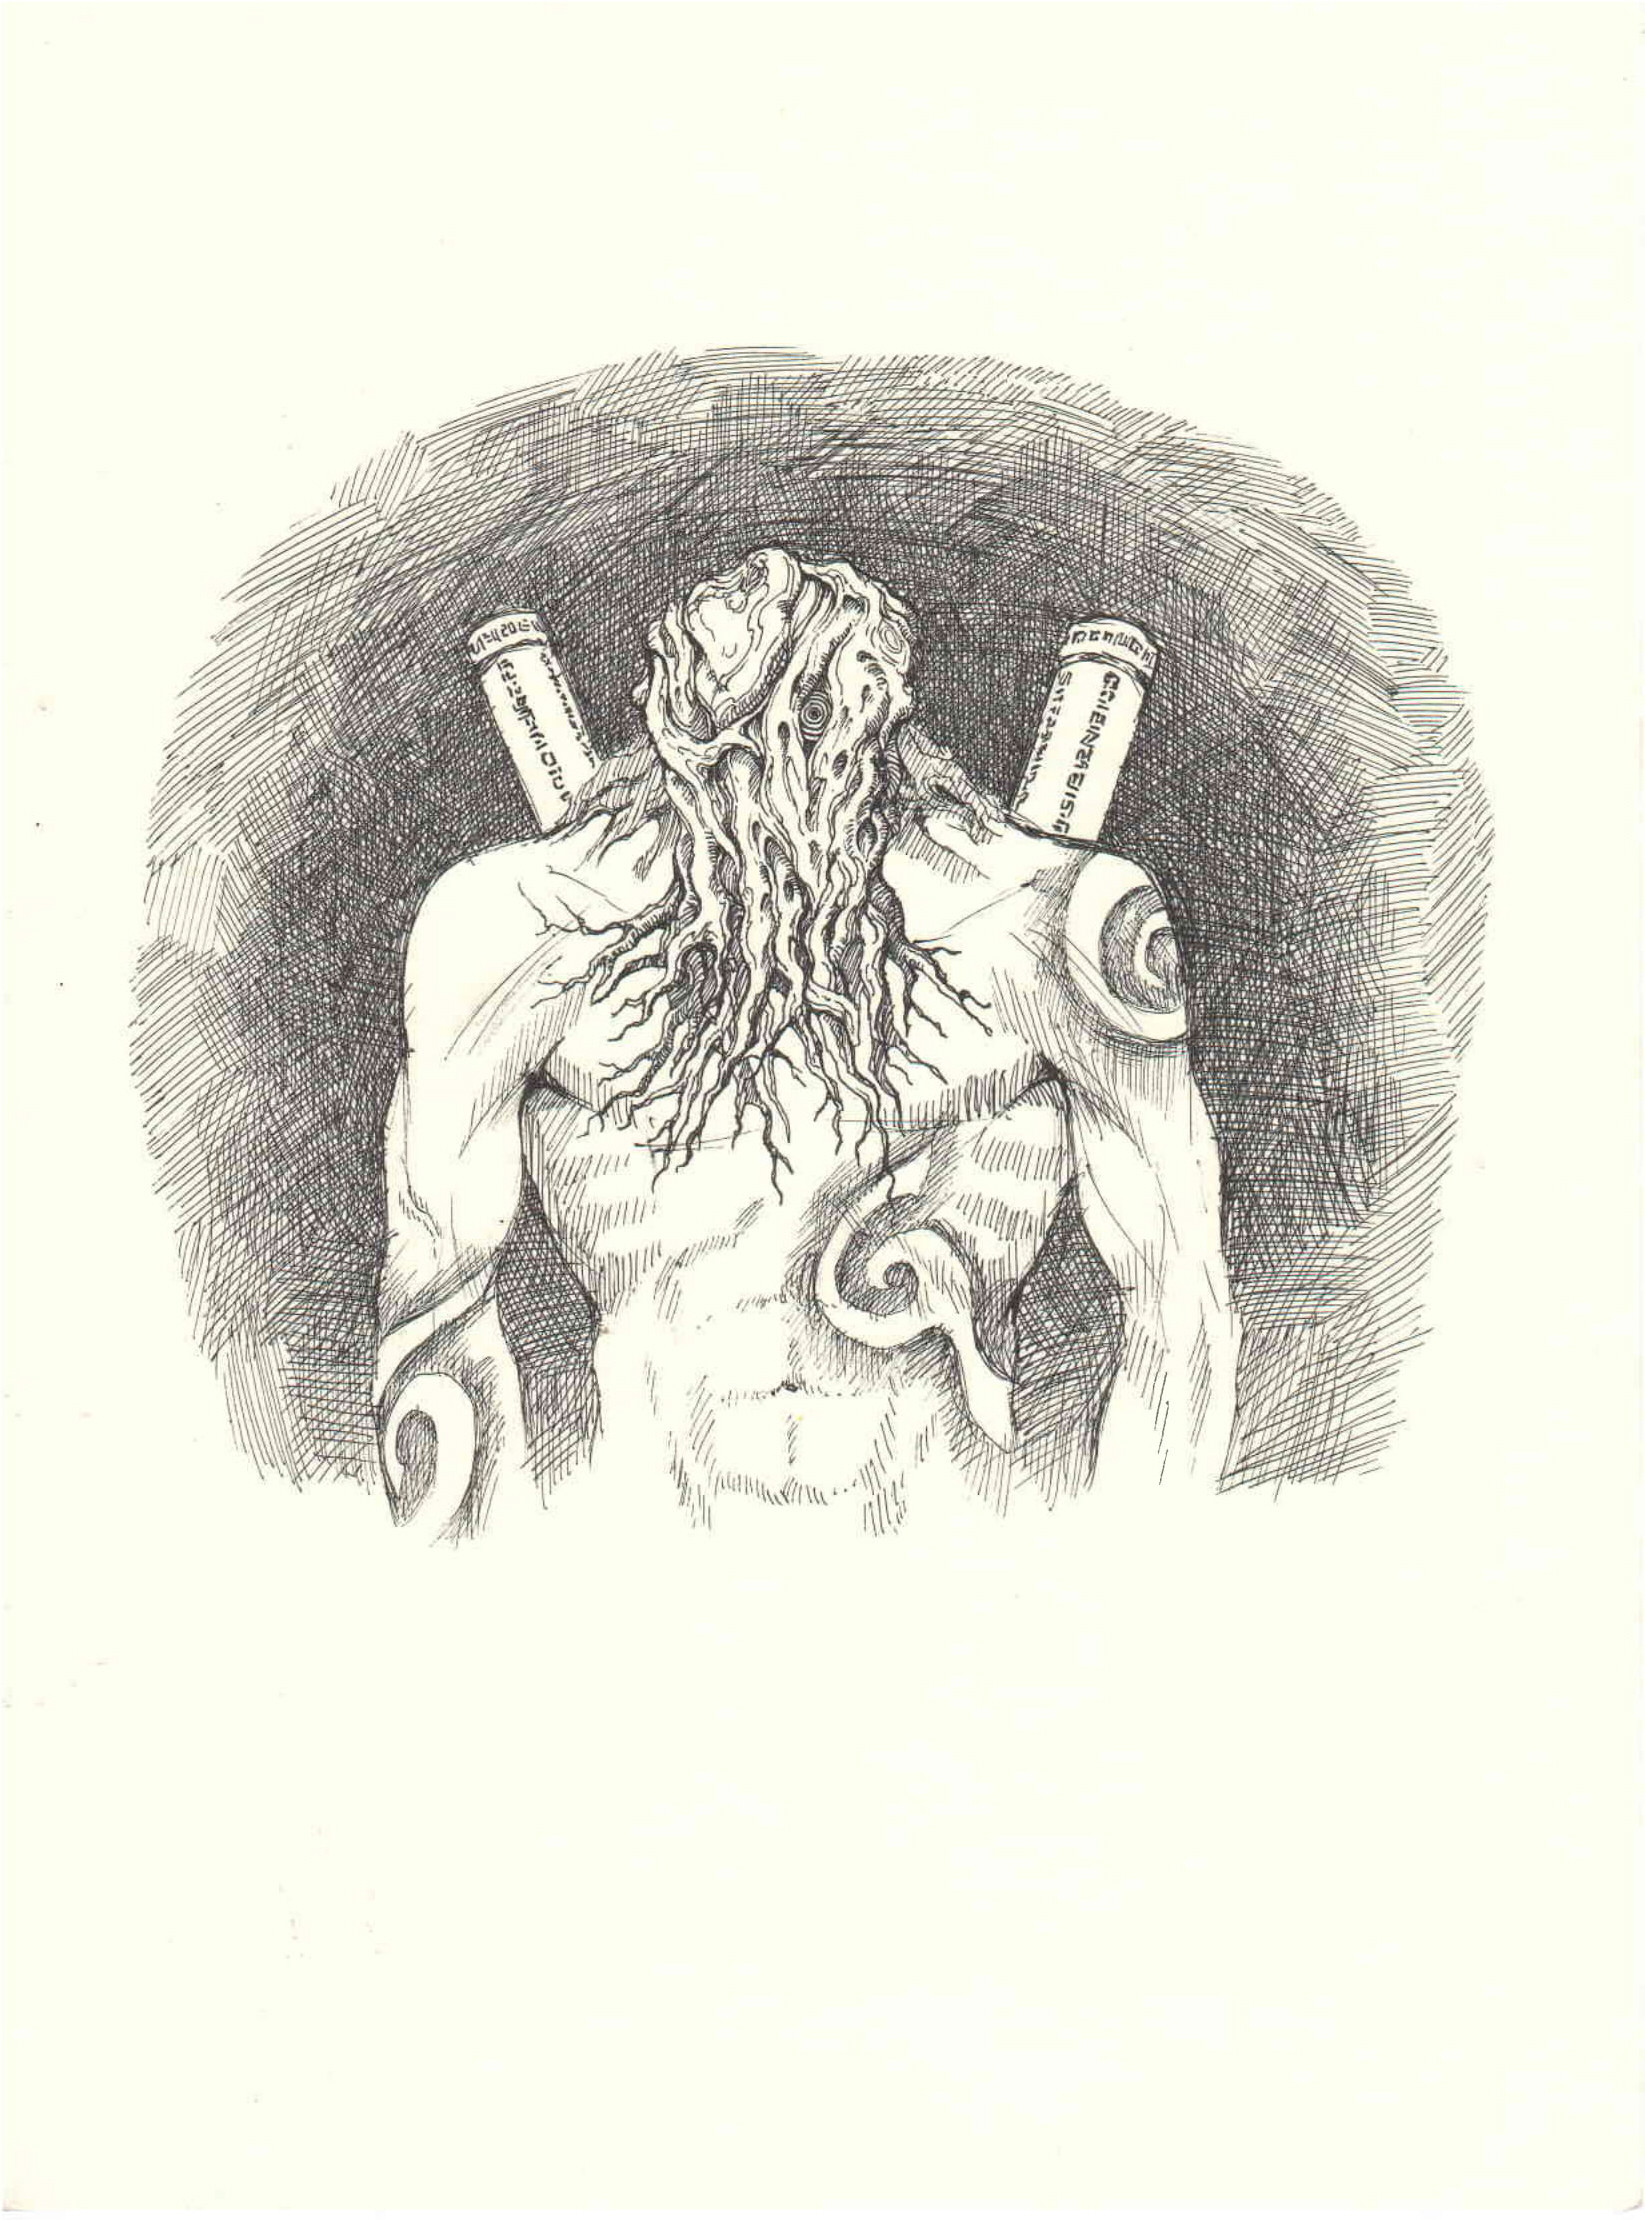 Lee Dabeen. Concept Art – The King's Familiar Spirit. 2018. Pen on paper, 282 x 210 mm.